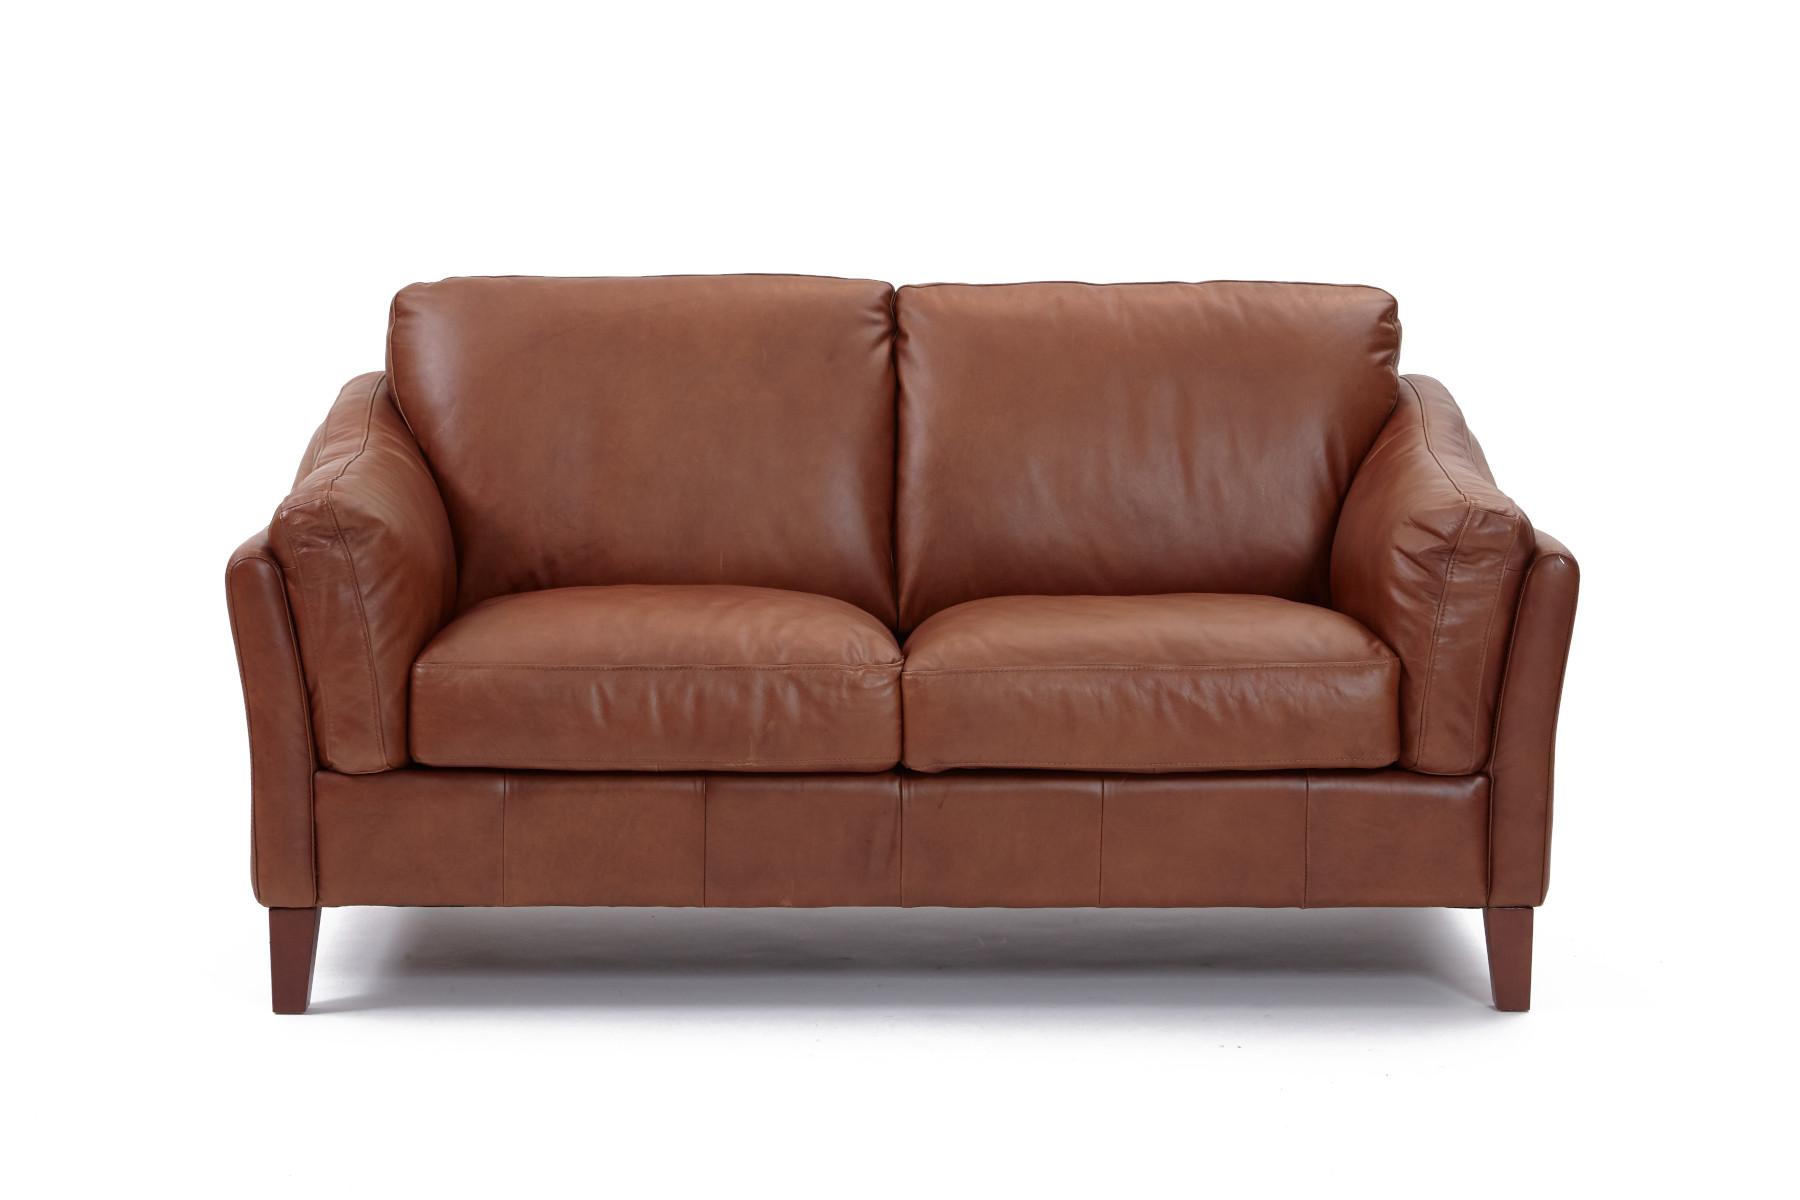 Randall 2 Seater Sofa